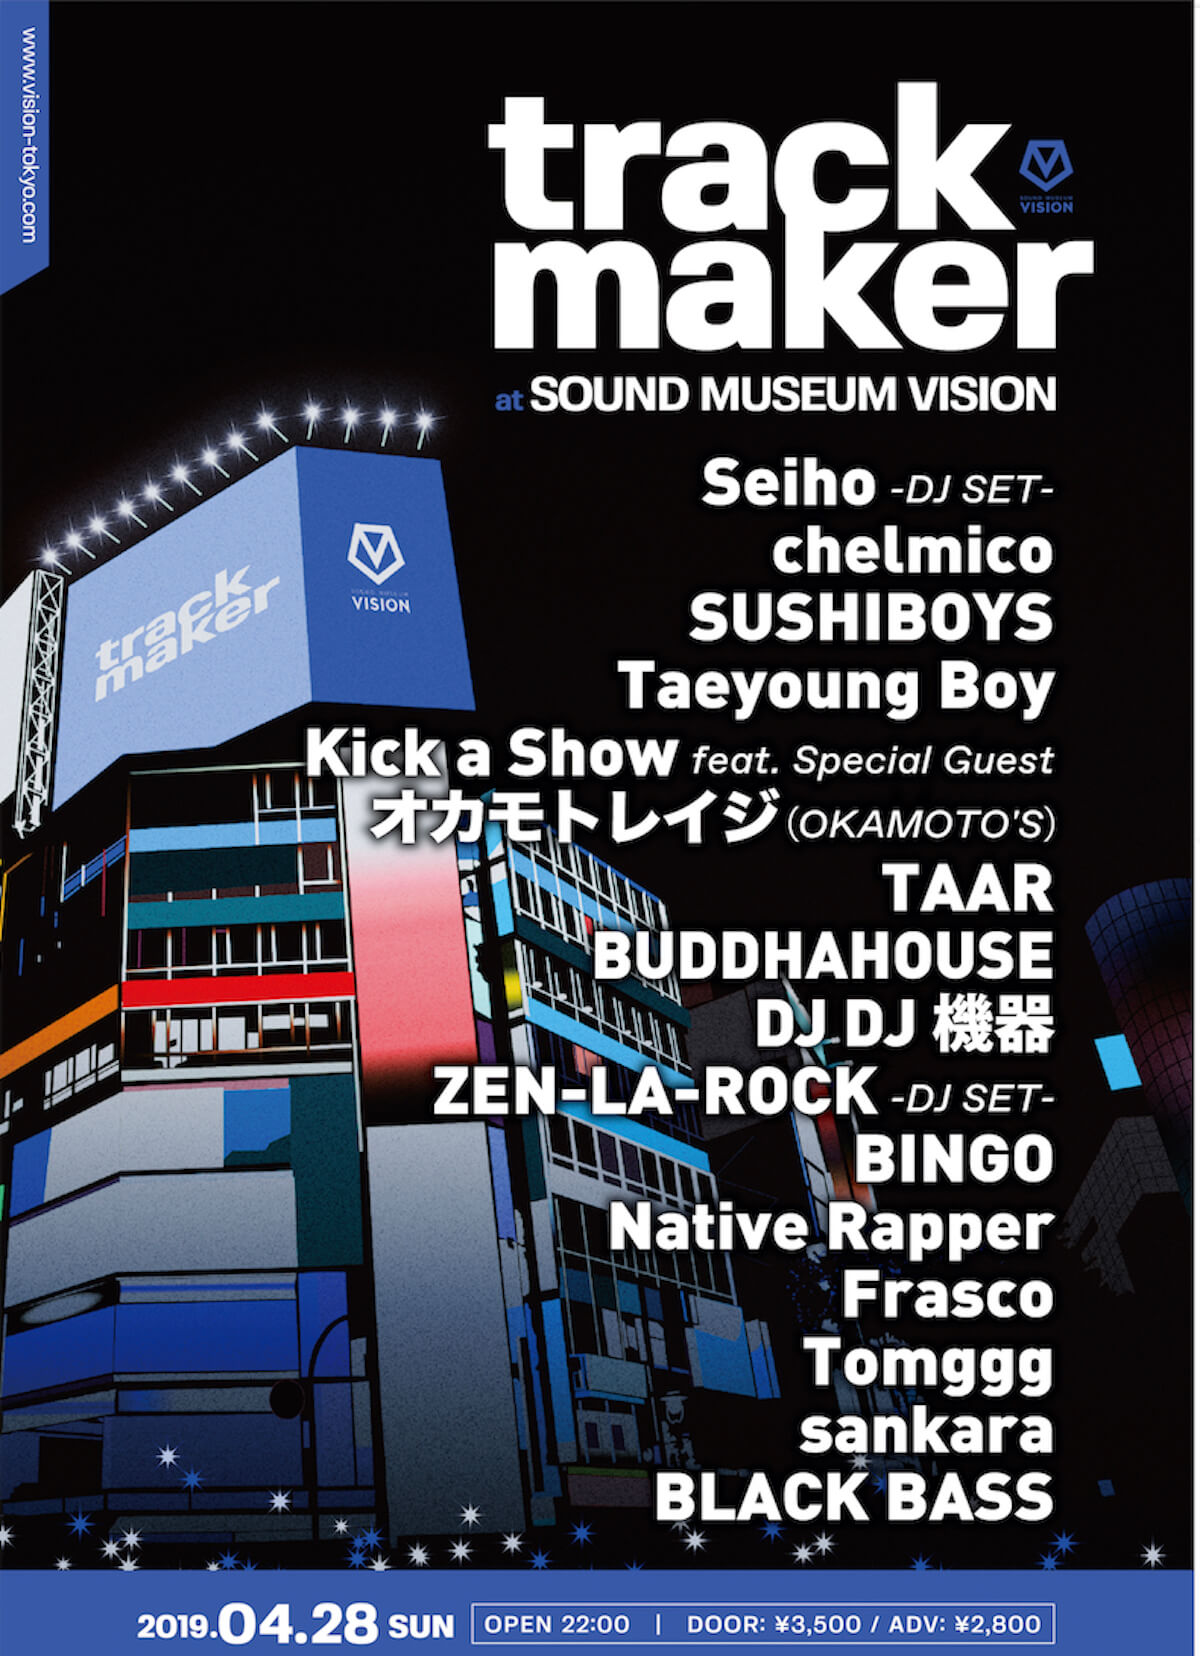 chelmico・SUSHIBOYSら実力派アーティストが4月28日渋谷VISION<trackmaker>に集結! music190423_trackmaker_1